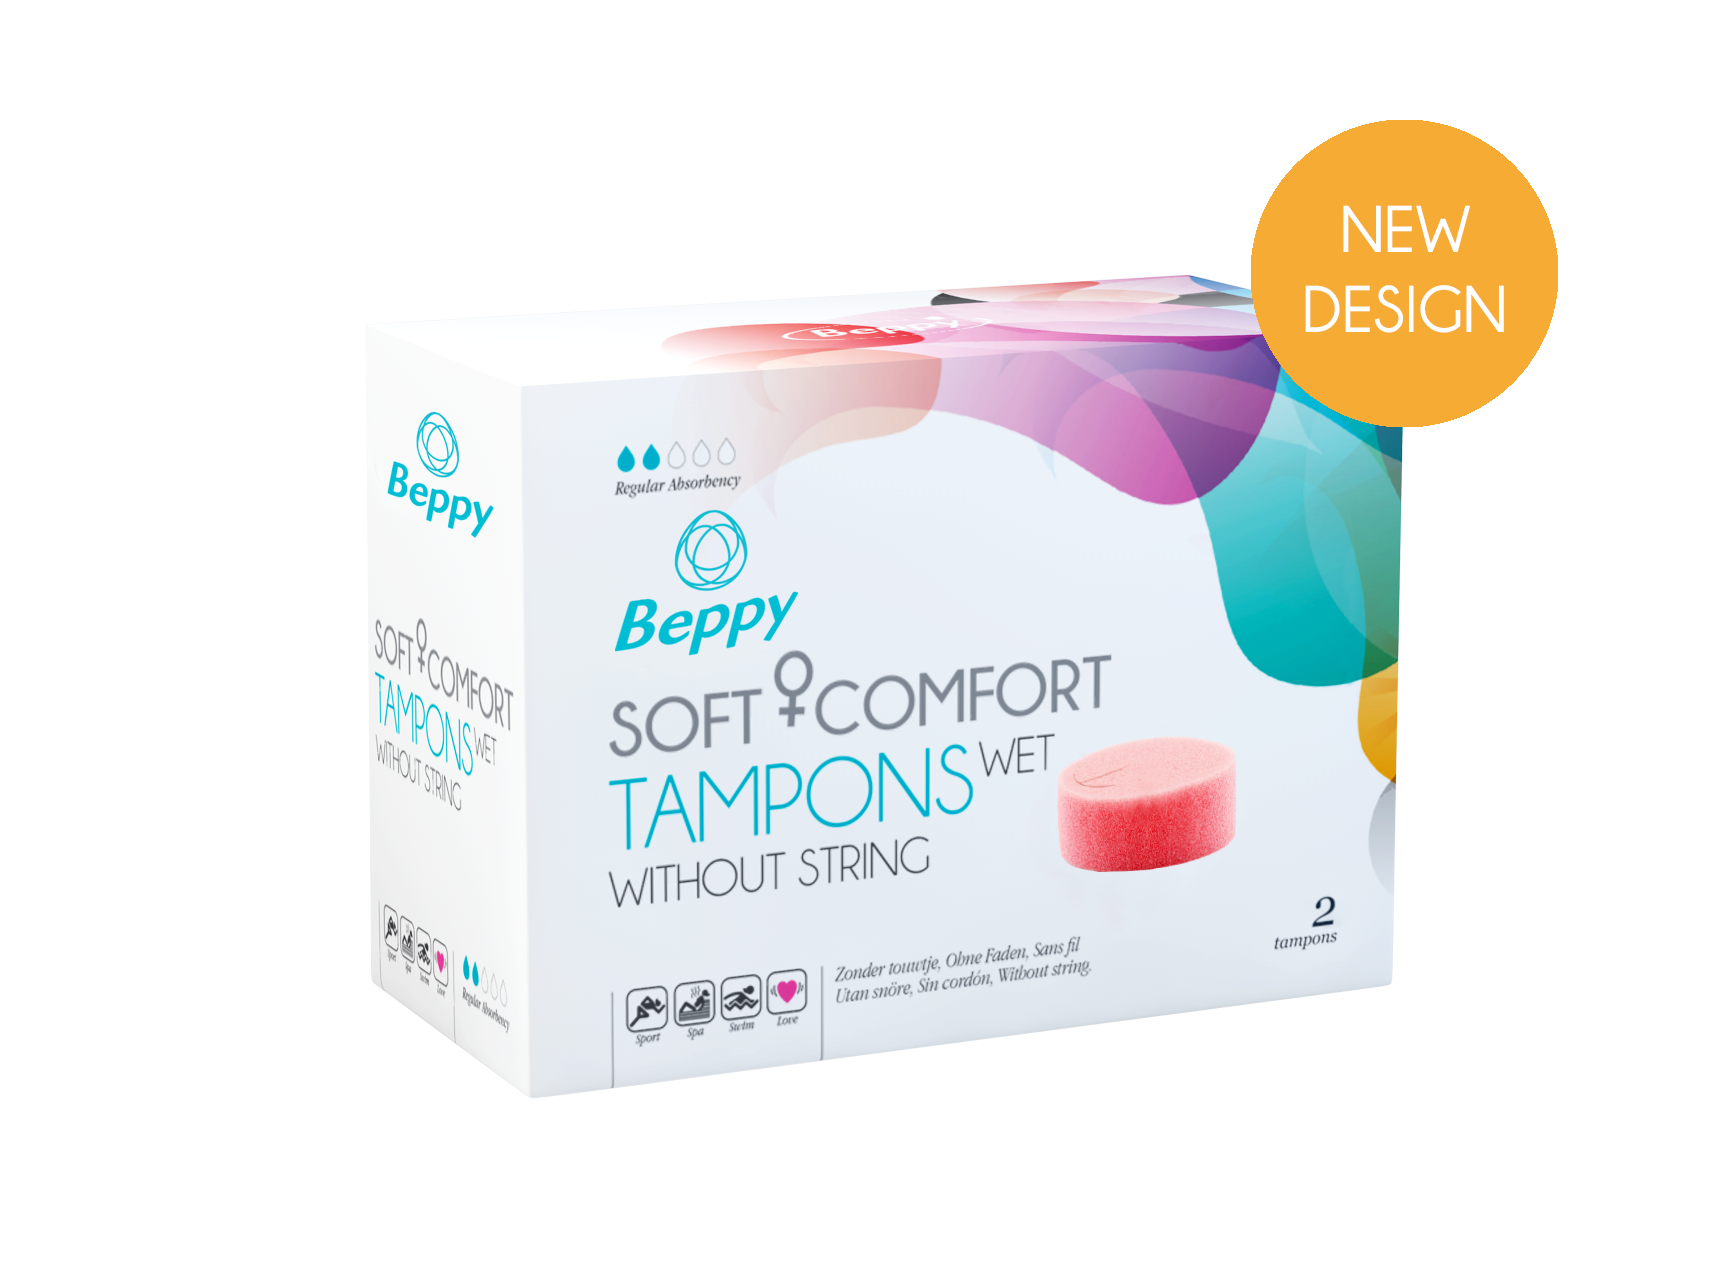 BEPPY Hygiene - Comfort - Tampons